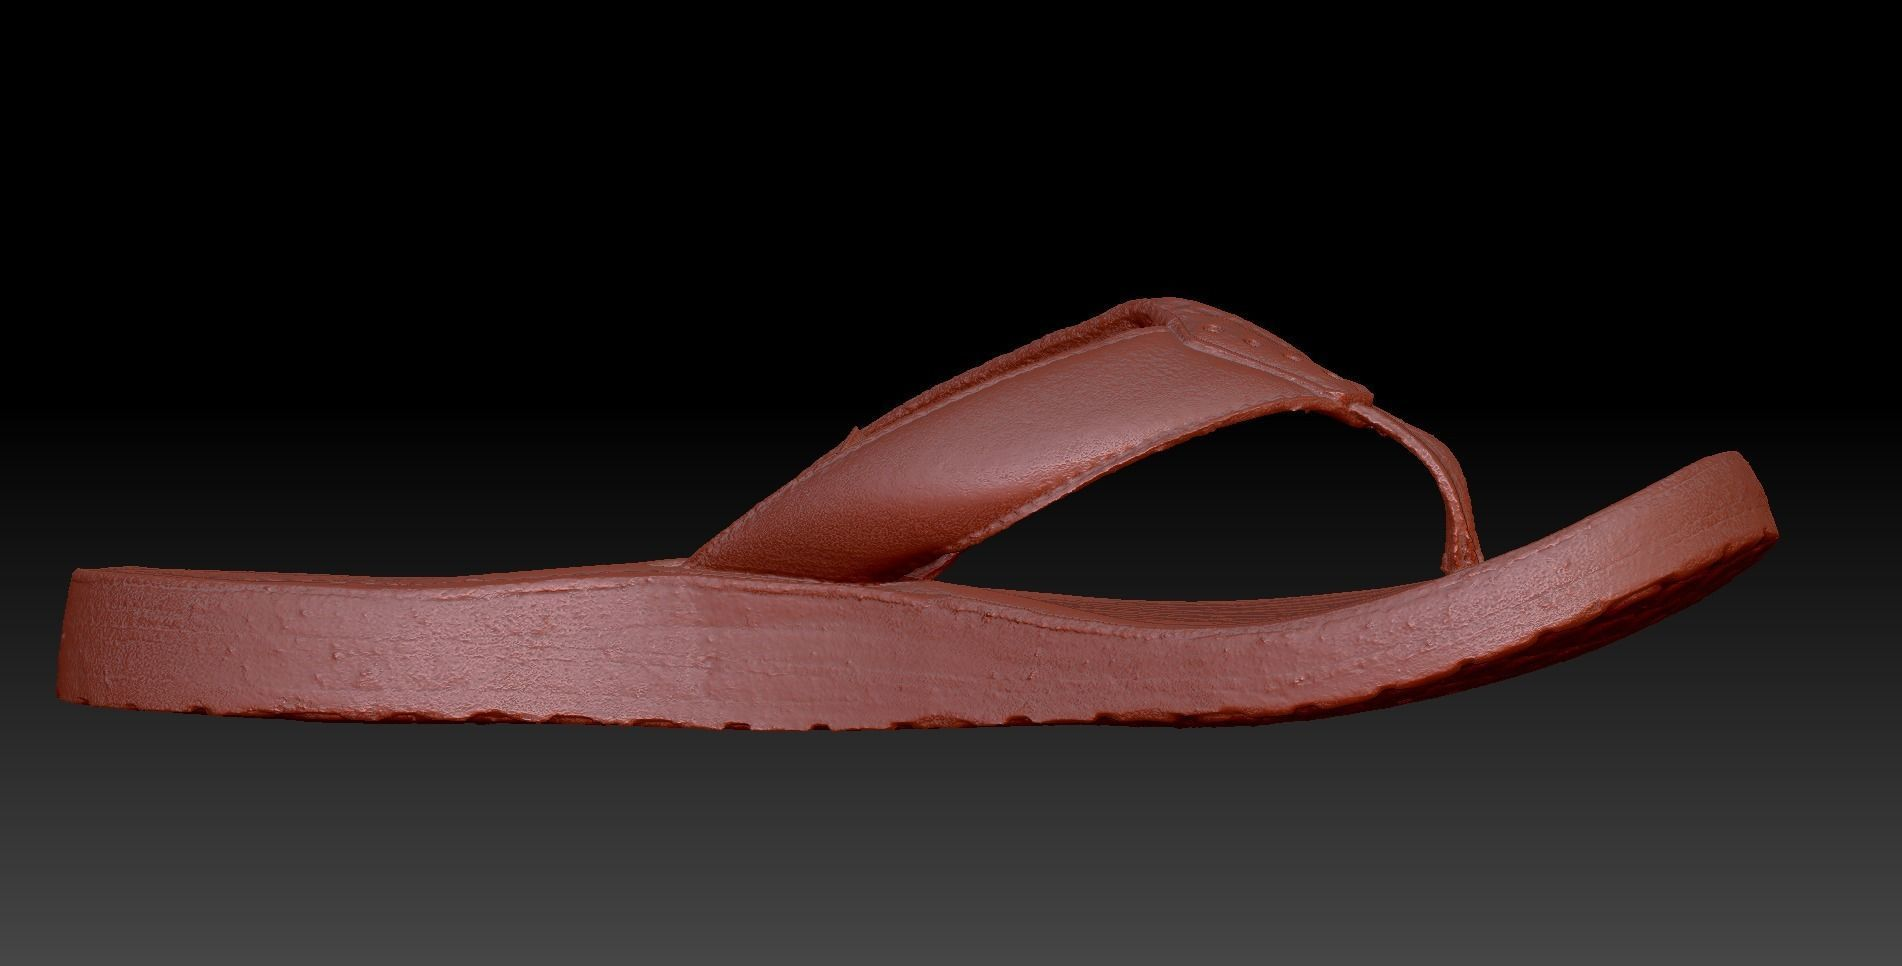 518eababeedde8 ... old teva sandal 3d model max fbx c4d ma mb 9 ...